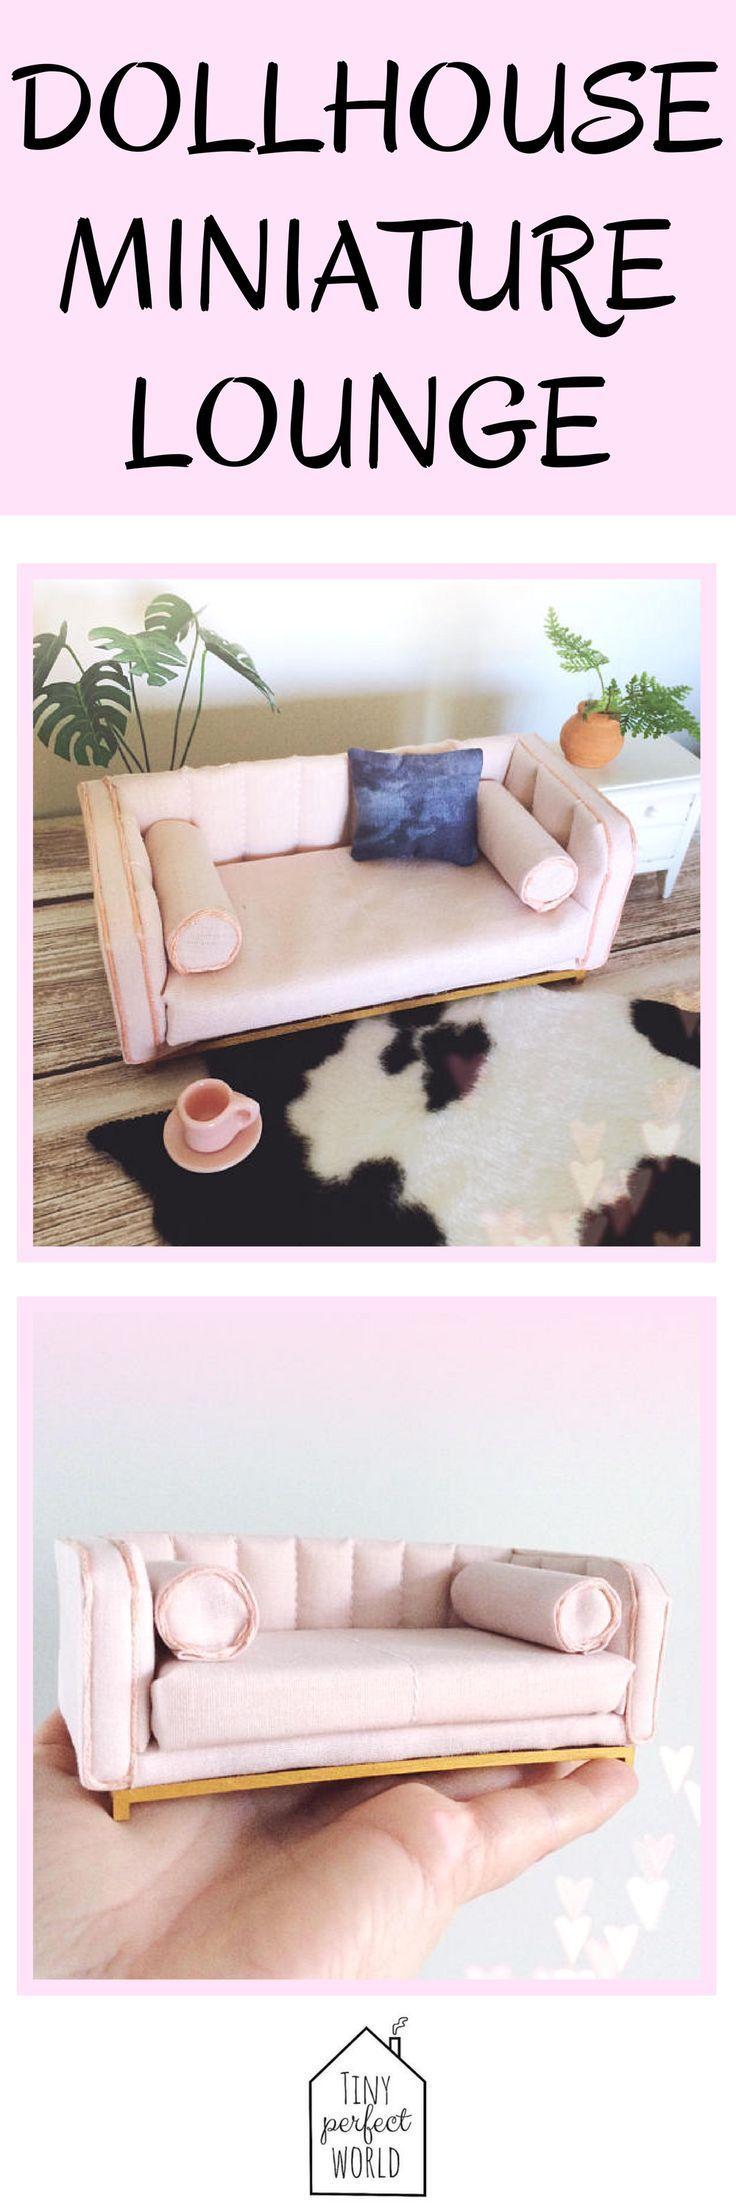 Miniature sofa, modern miniature couch, miniature lounge, designer sofa,  pink sofa, modern dollhouse furniture, blush pink dollhouse